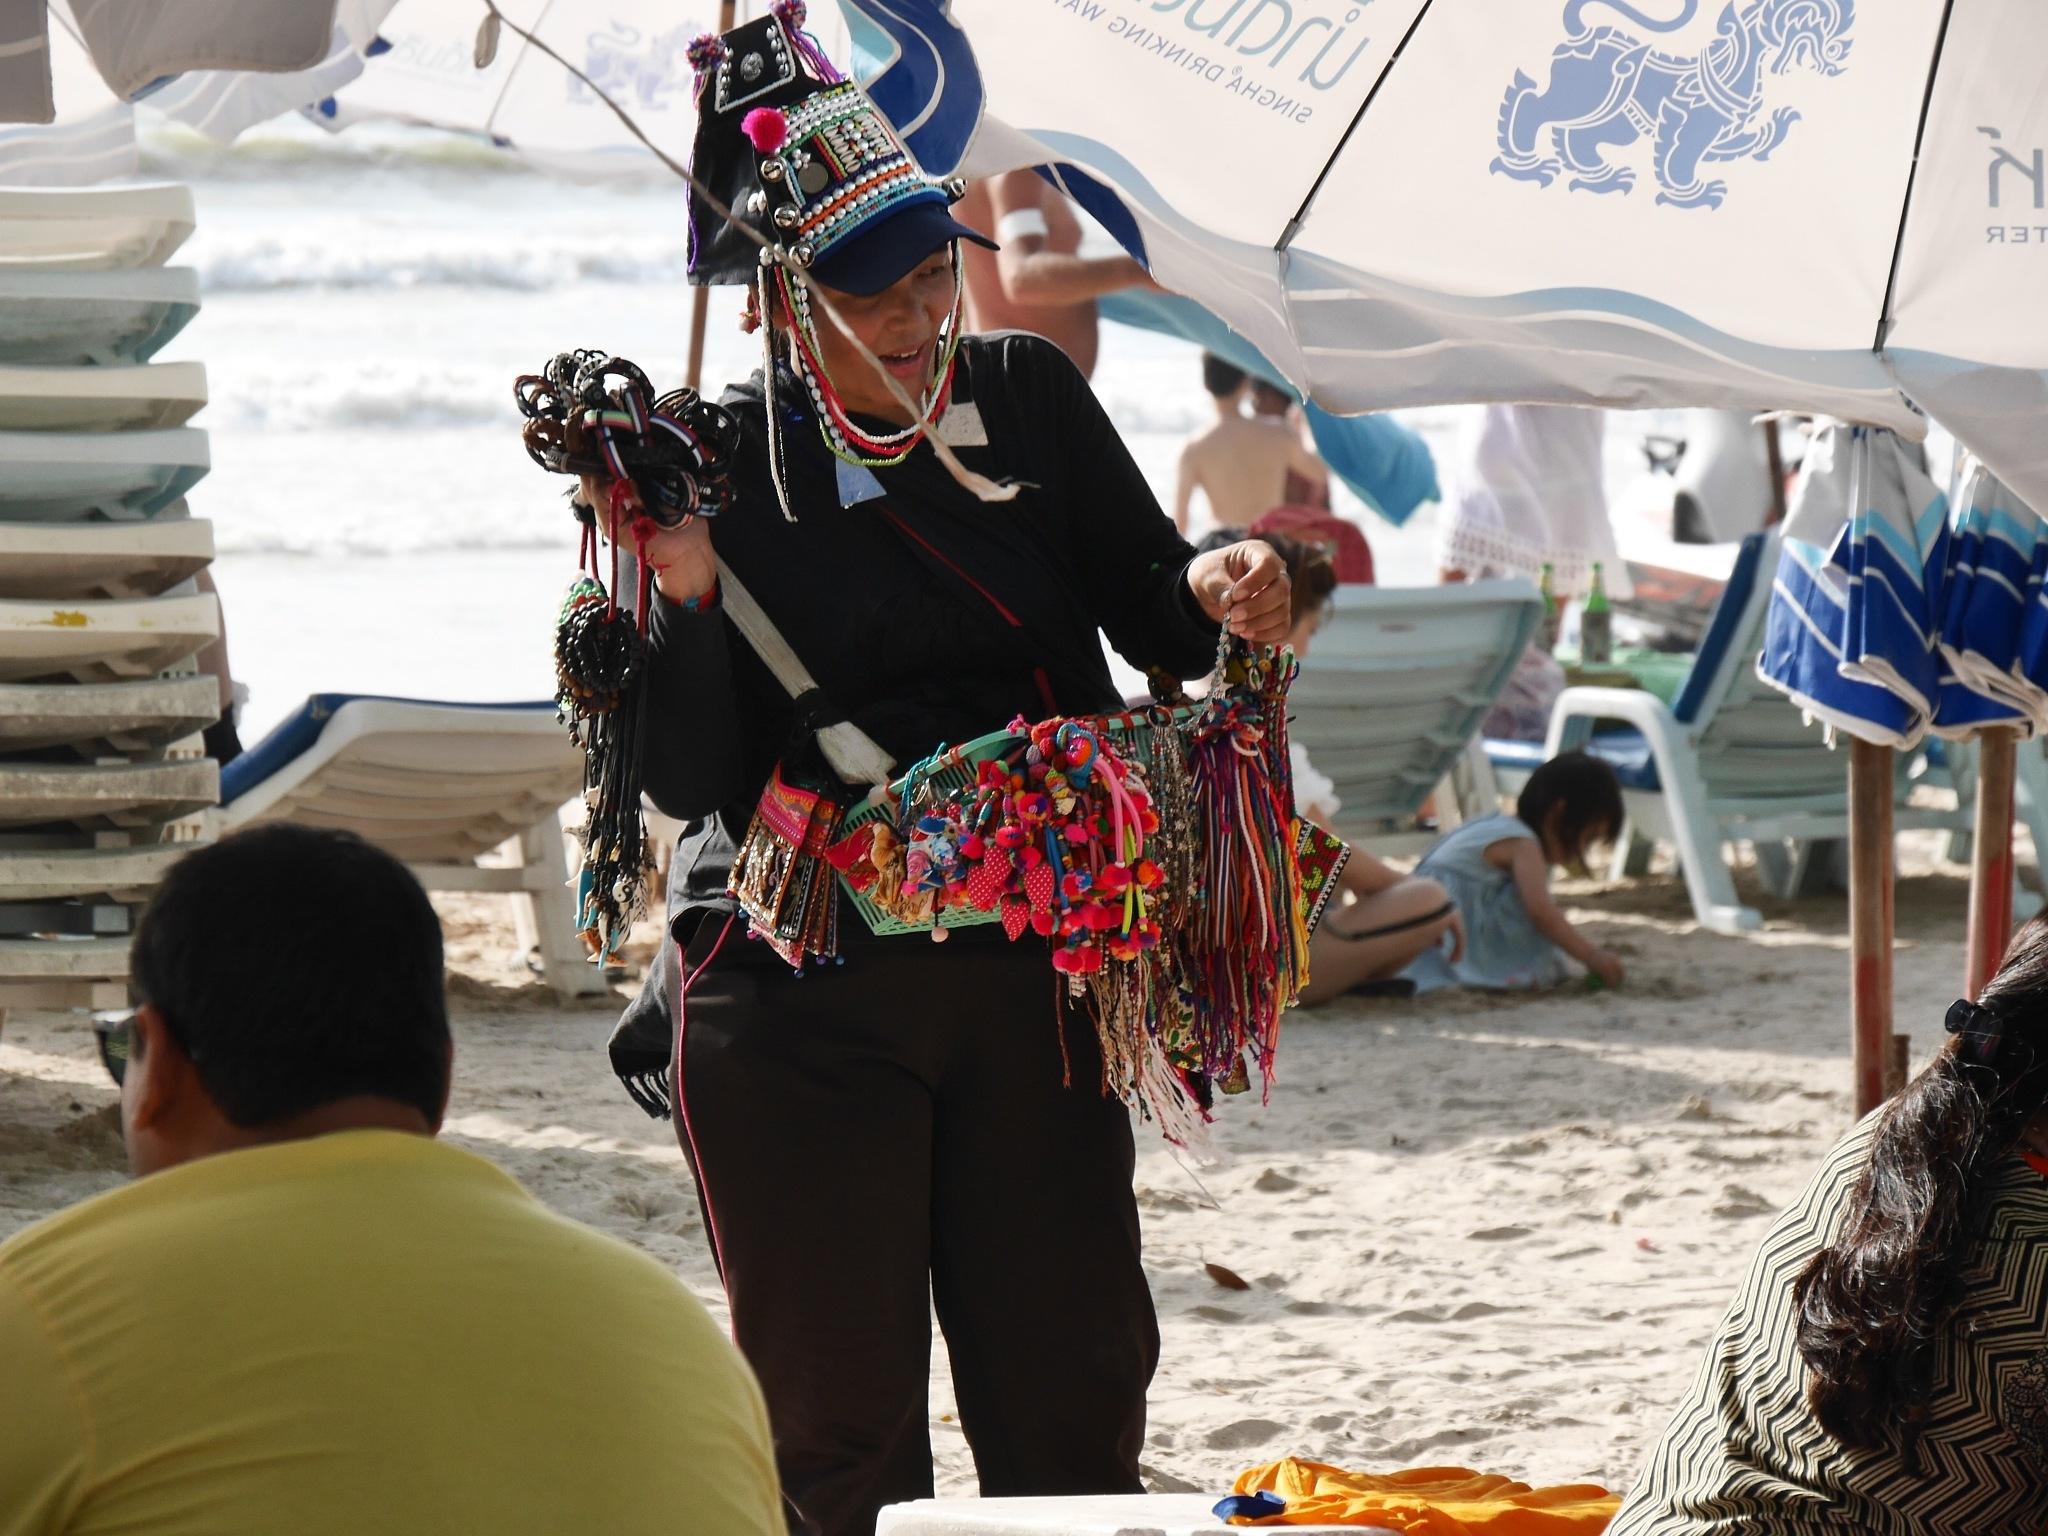 beach vendor by tonyhart